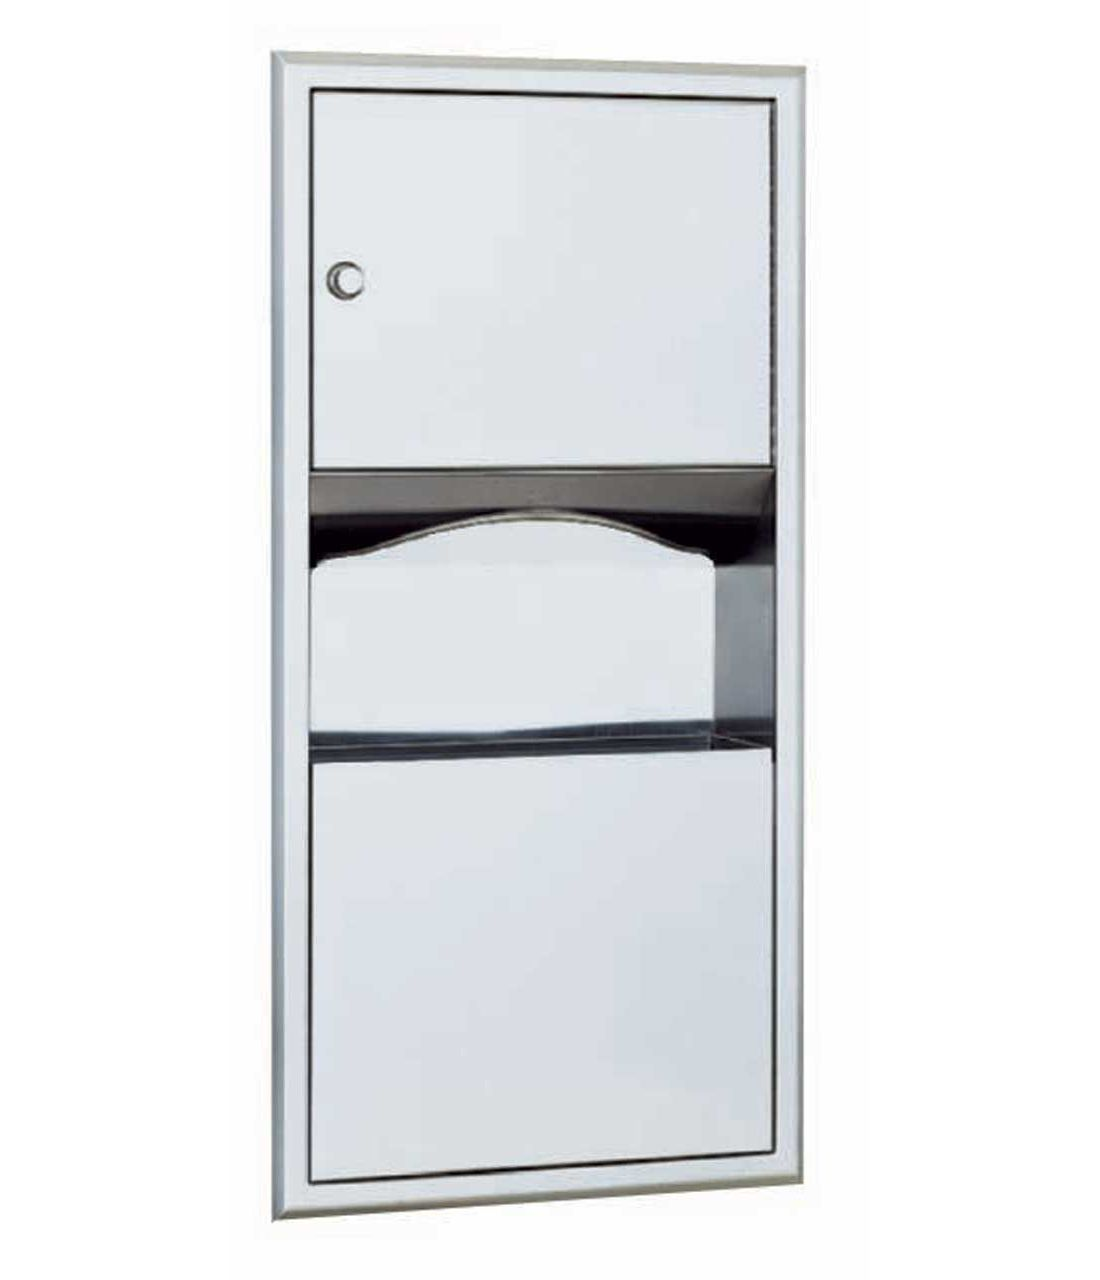 Paper Towl Dispenser And Trash Can Unit Bobrick B 369  # Muebles Bobrick